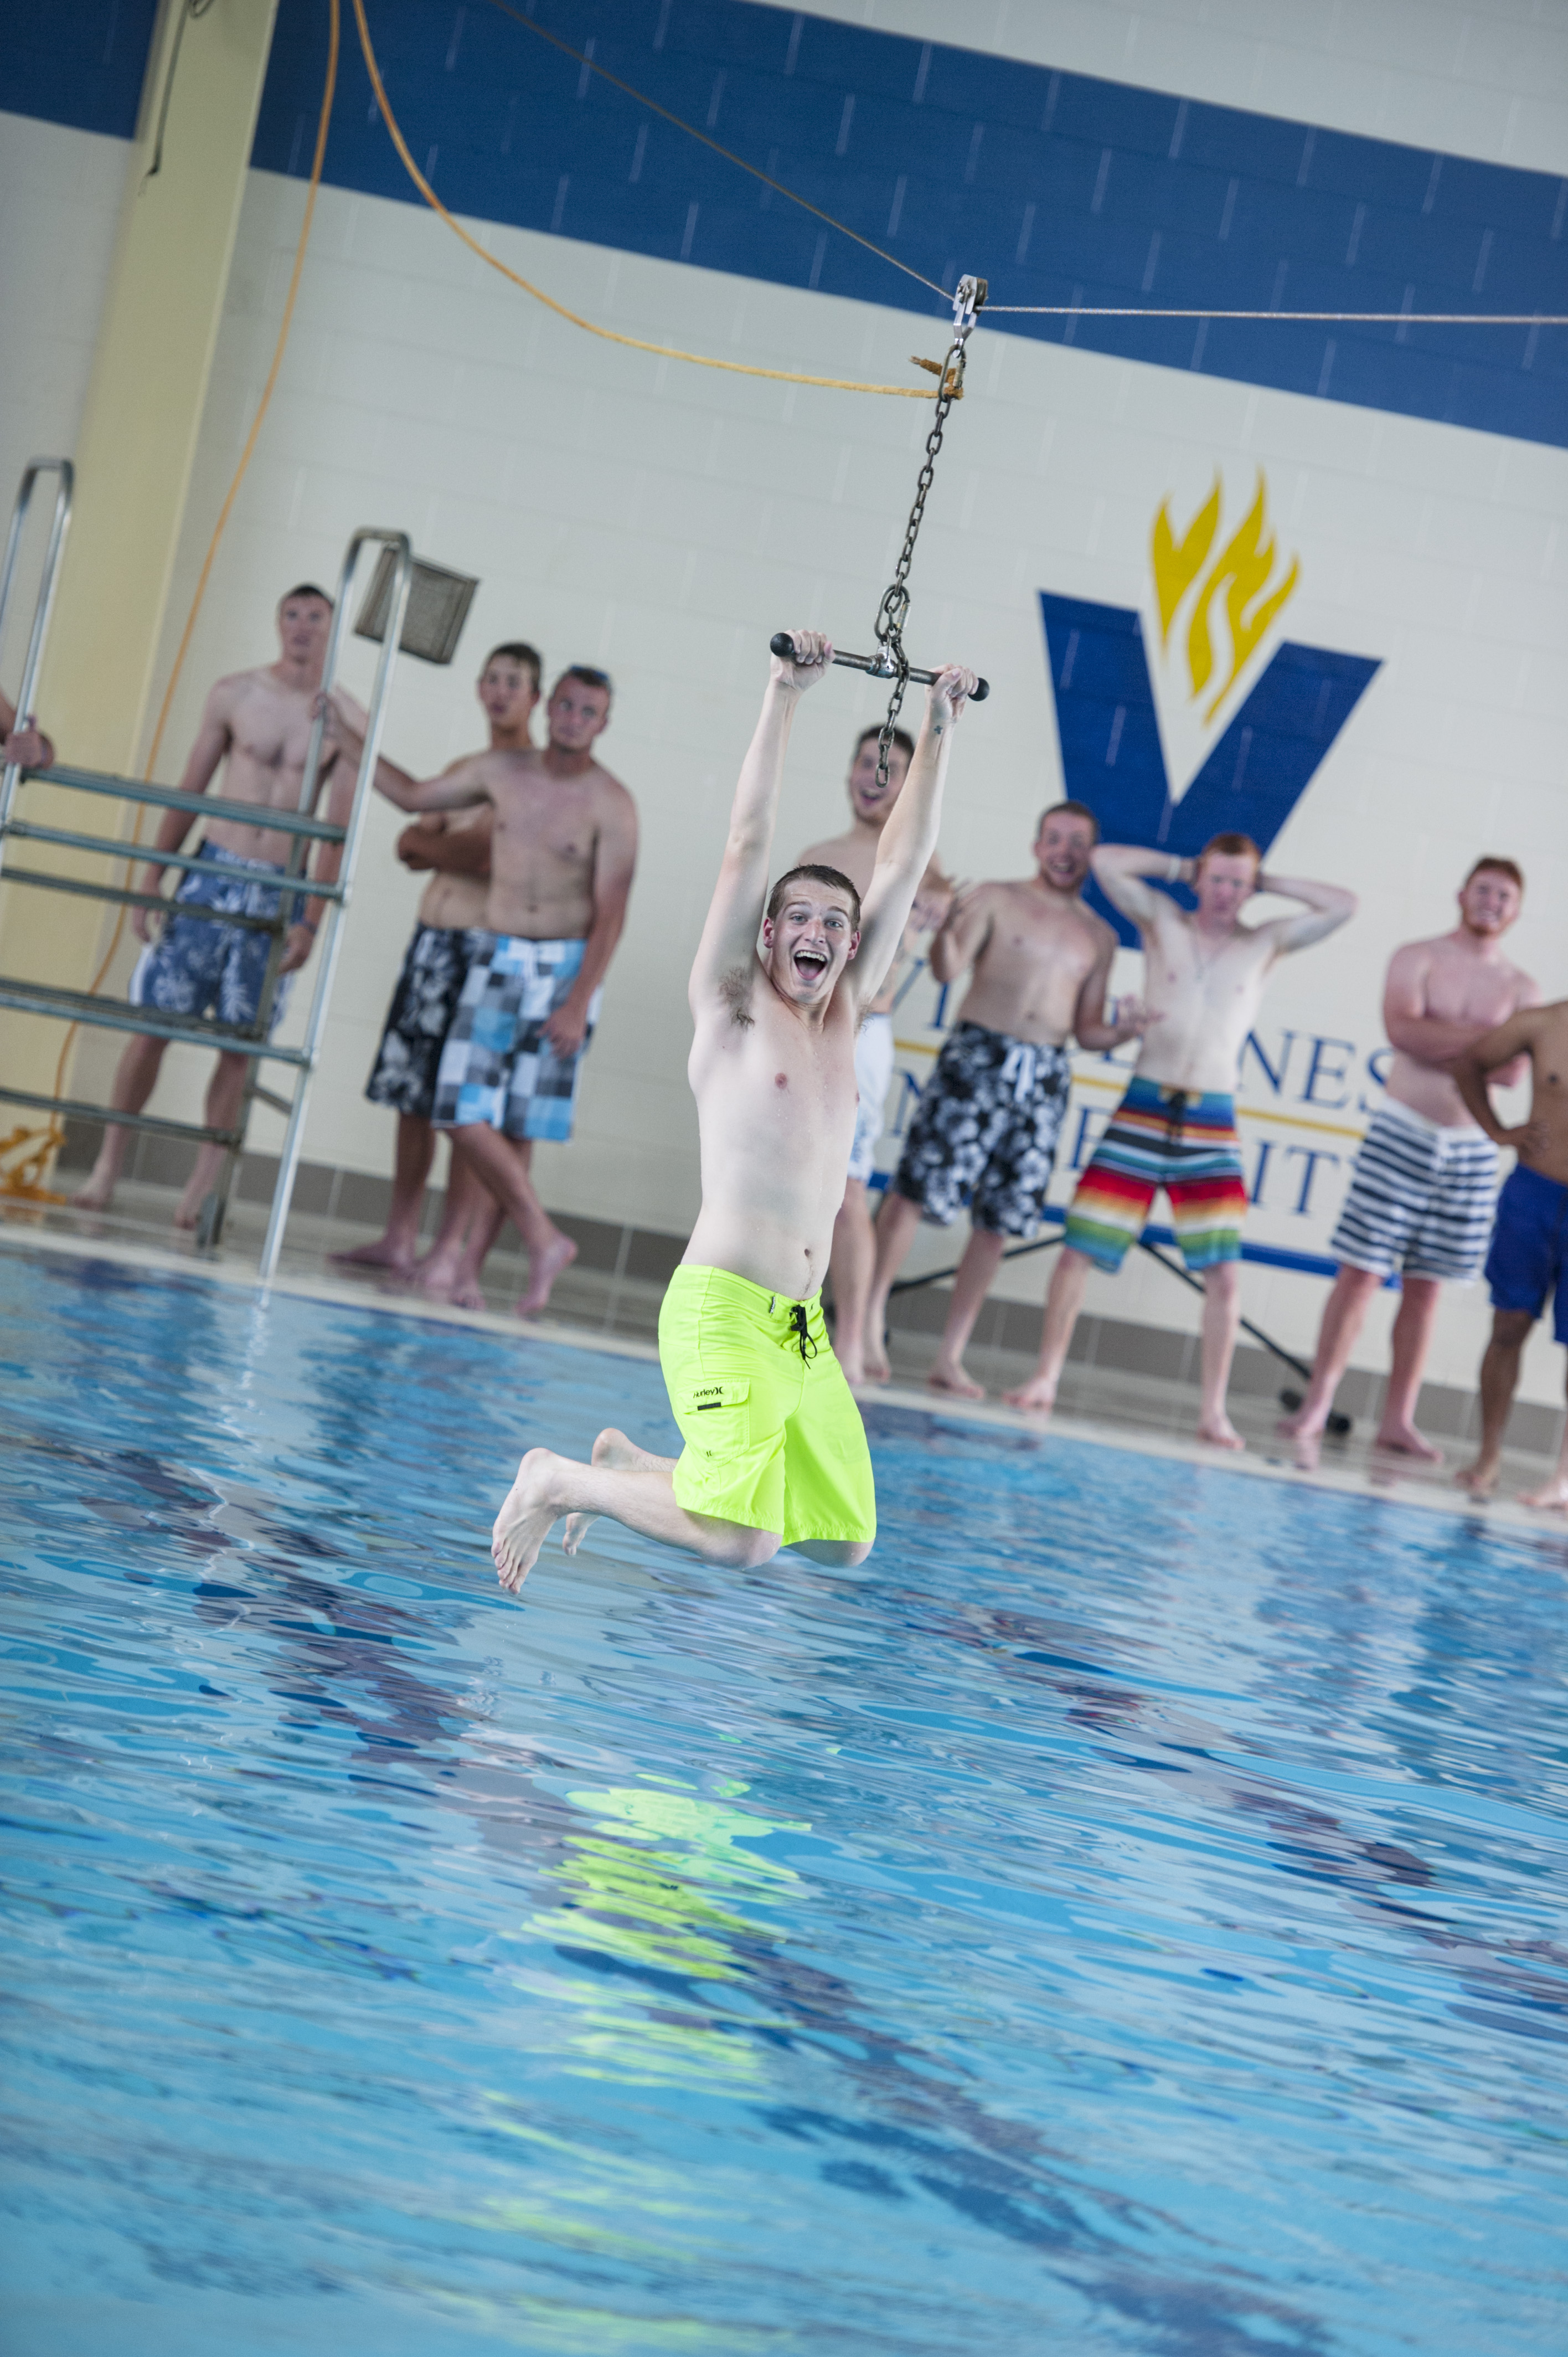 Aquatic Center - Vincennes University